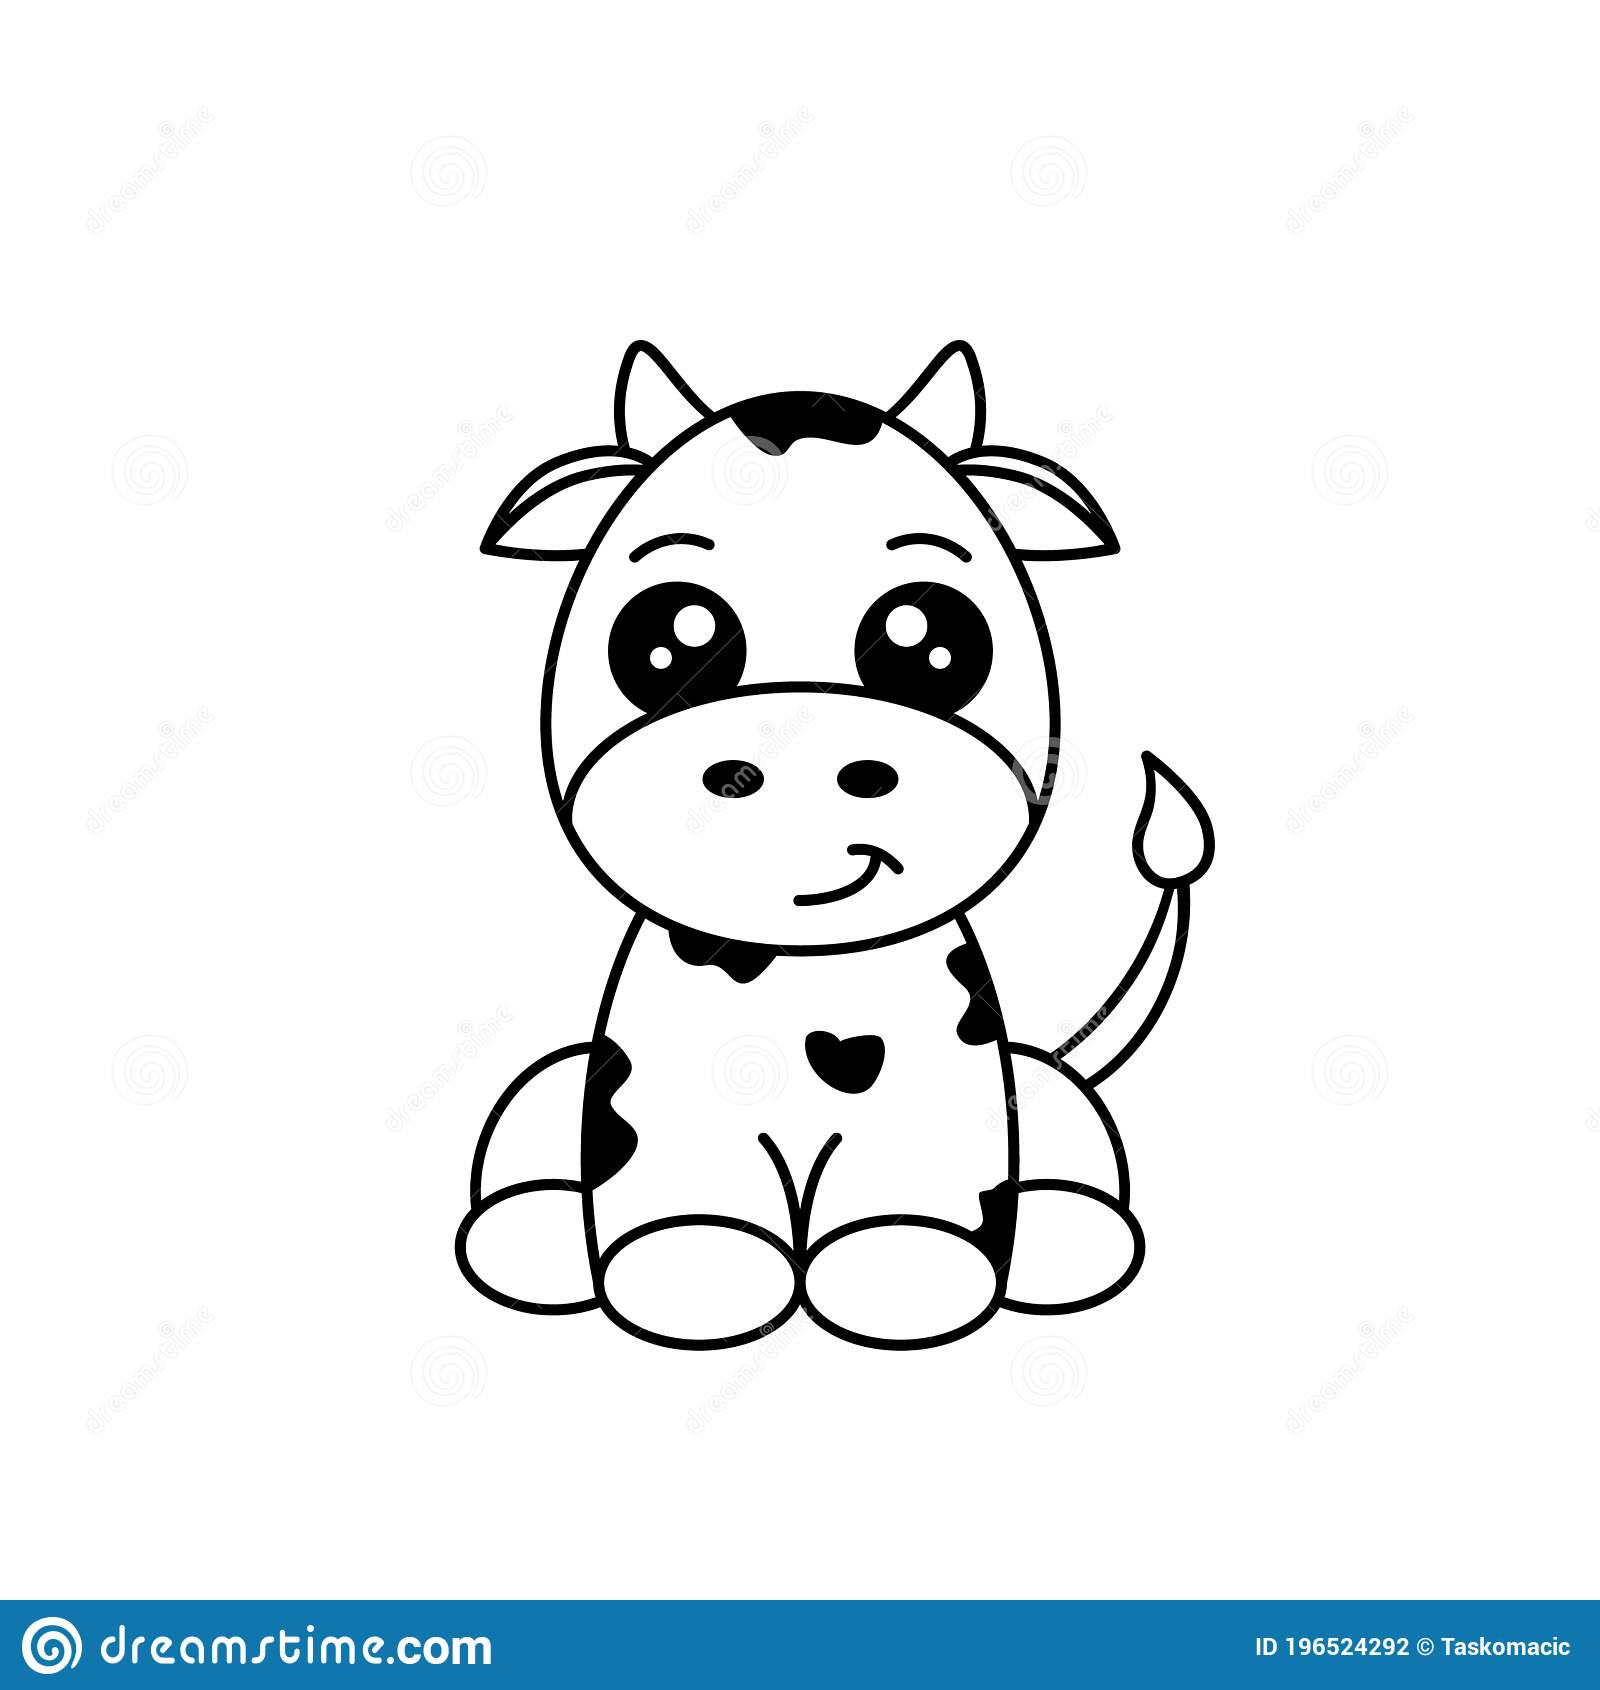 Clip Art Baby Calf Stock Illustrations 696 Clip Art Baby Calf Stock Illustrations Vectors Clipart Dreamstime